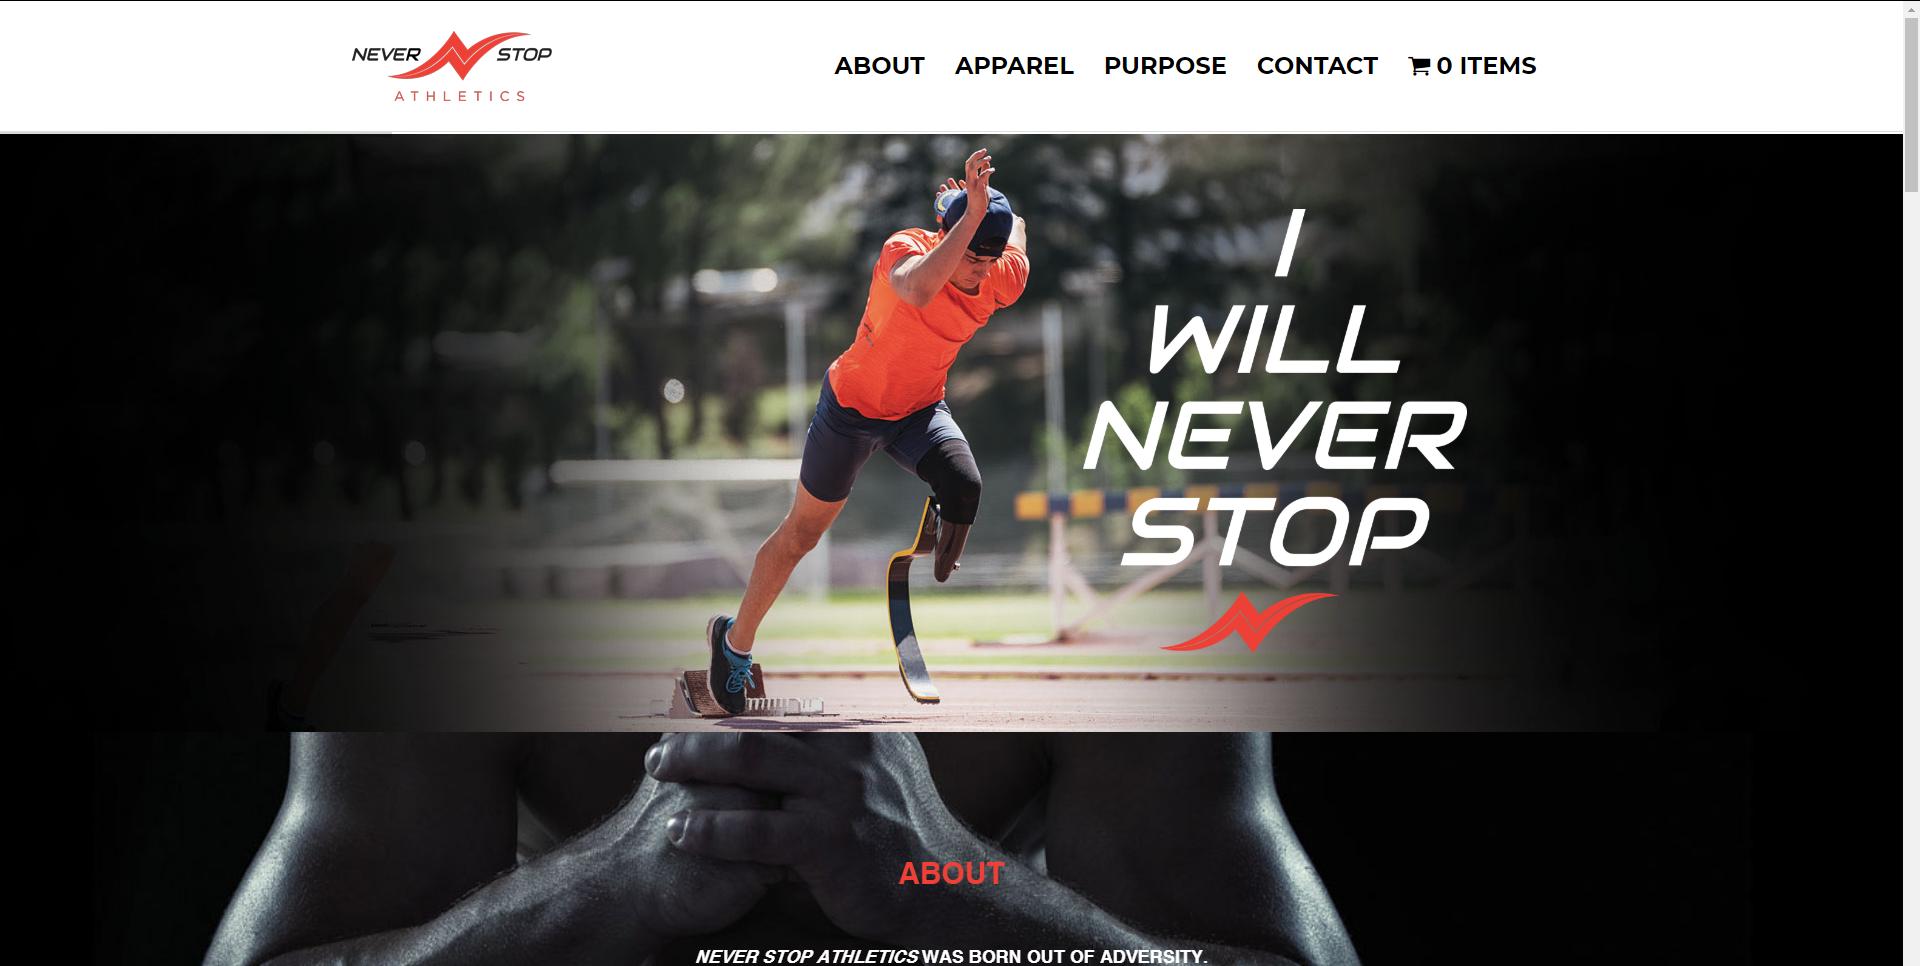 Never Stop Athletics website